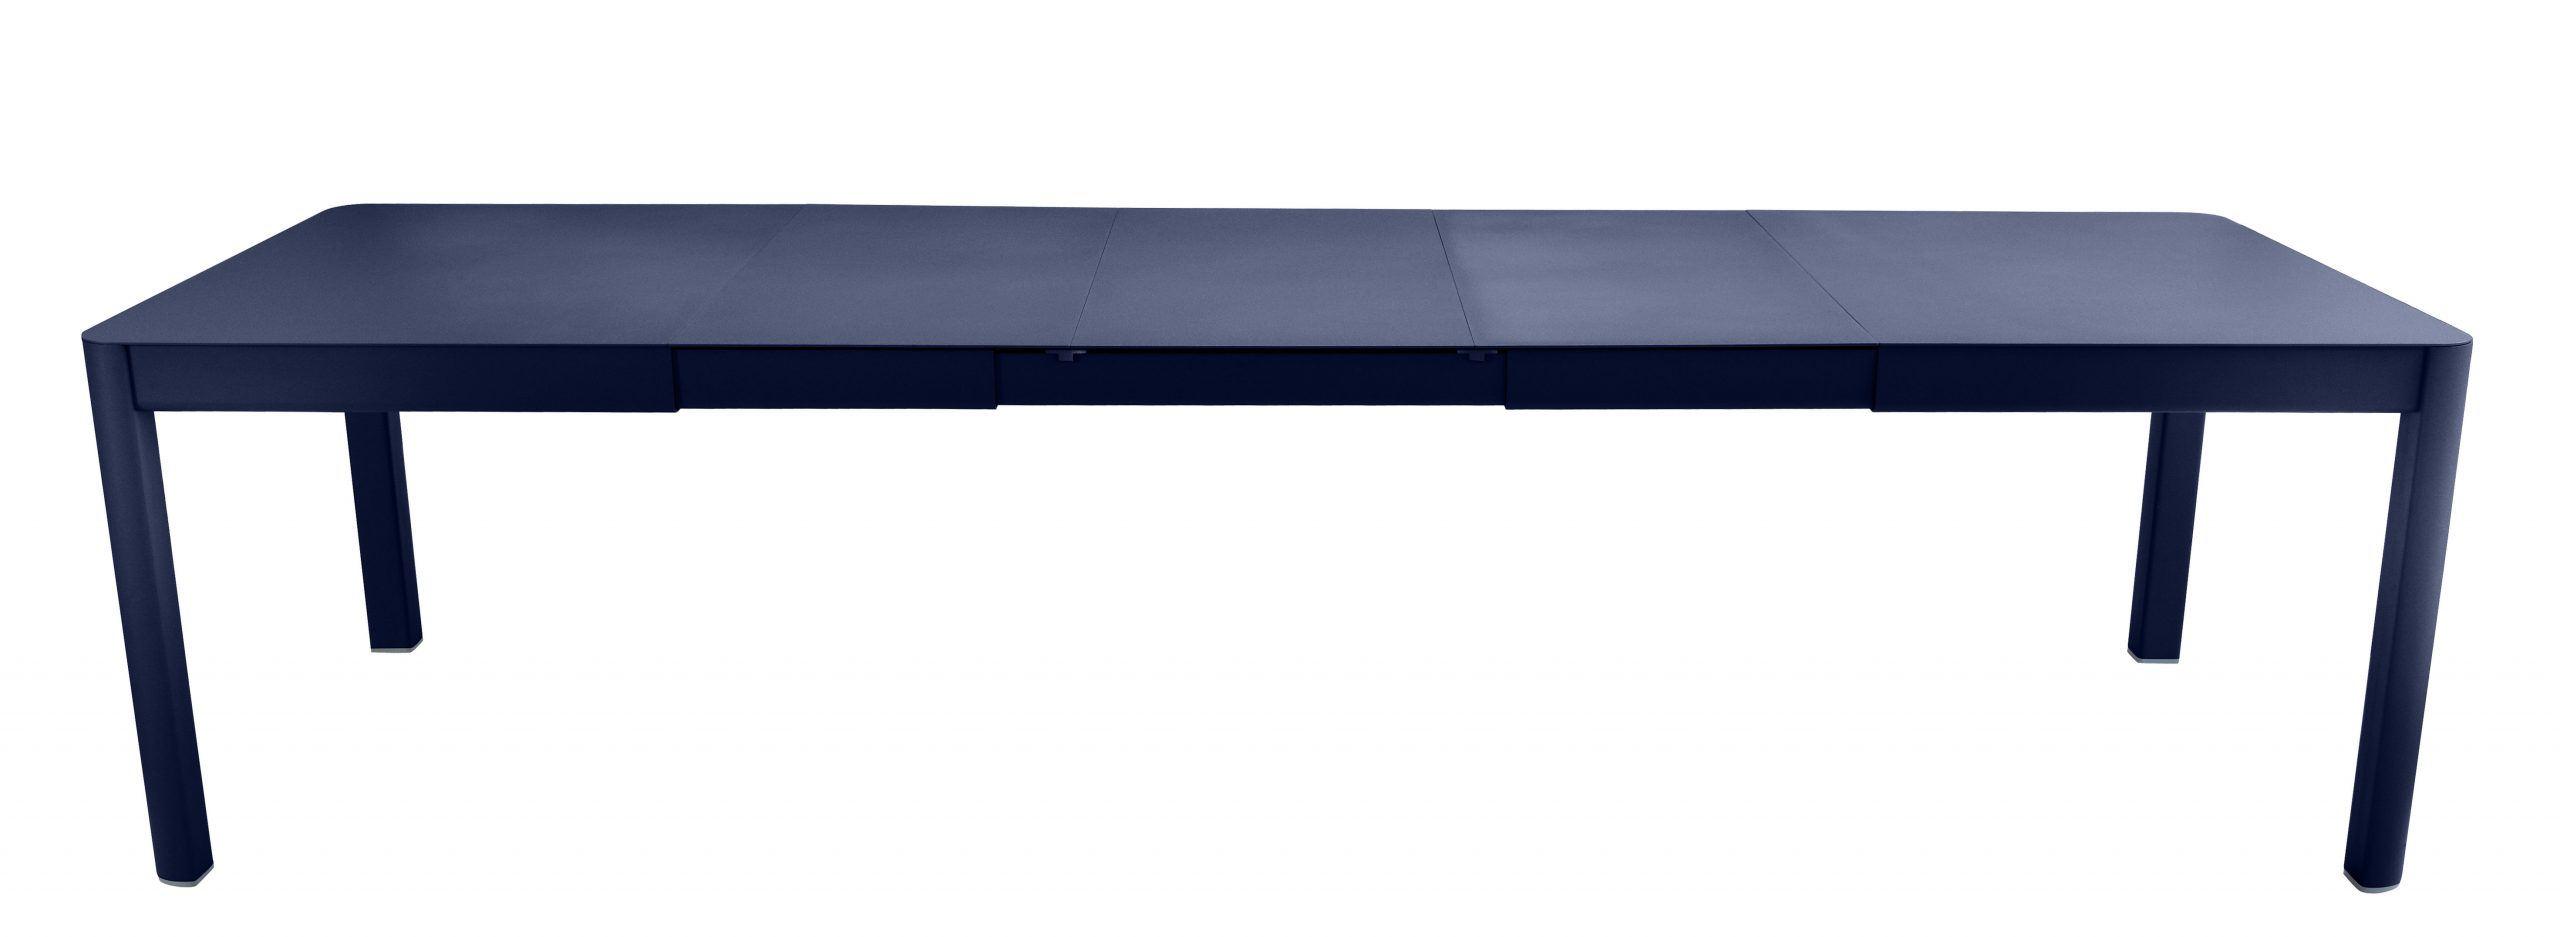 Table À Rallonge Ribambelle Xl Fermob - Bleu | Made In Design encequiconcerne Table Fermob Cargo Soldes